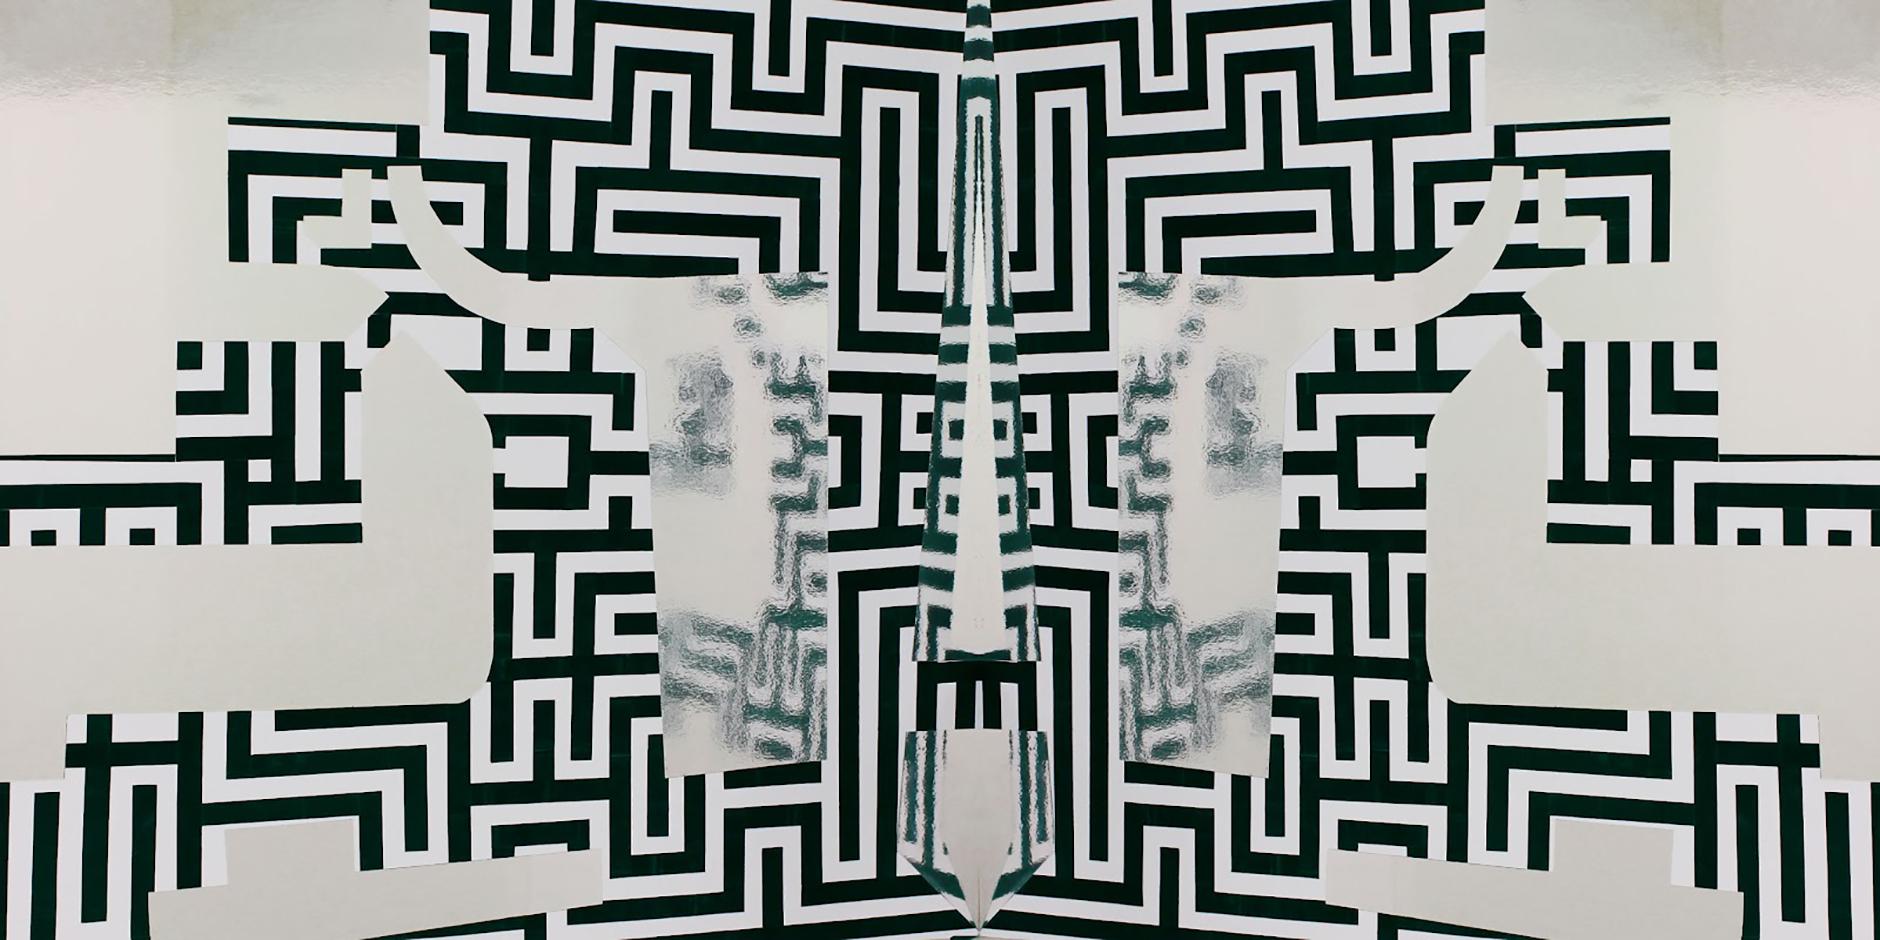 Marilyn Schneider, Level 1 Westfield, 2011, felt scratch guard and foil board, 180 x 90cm.